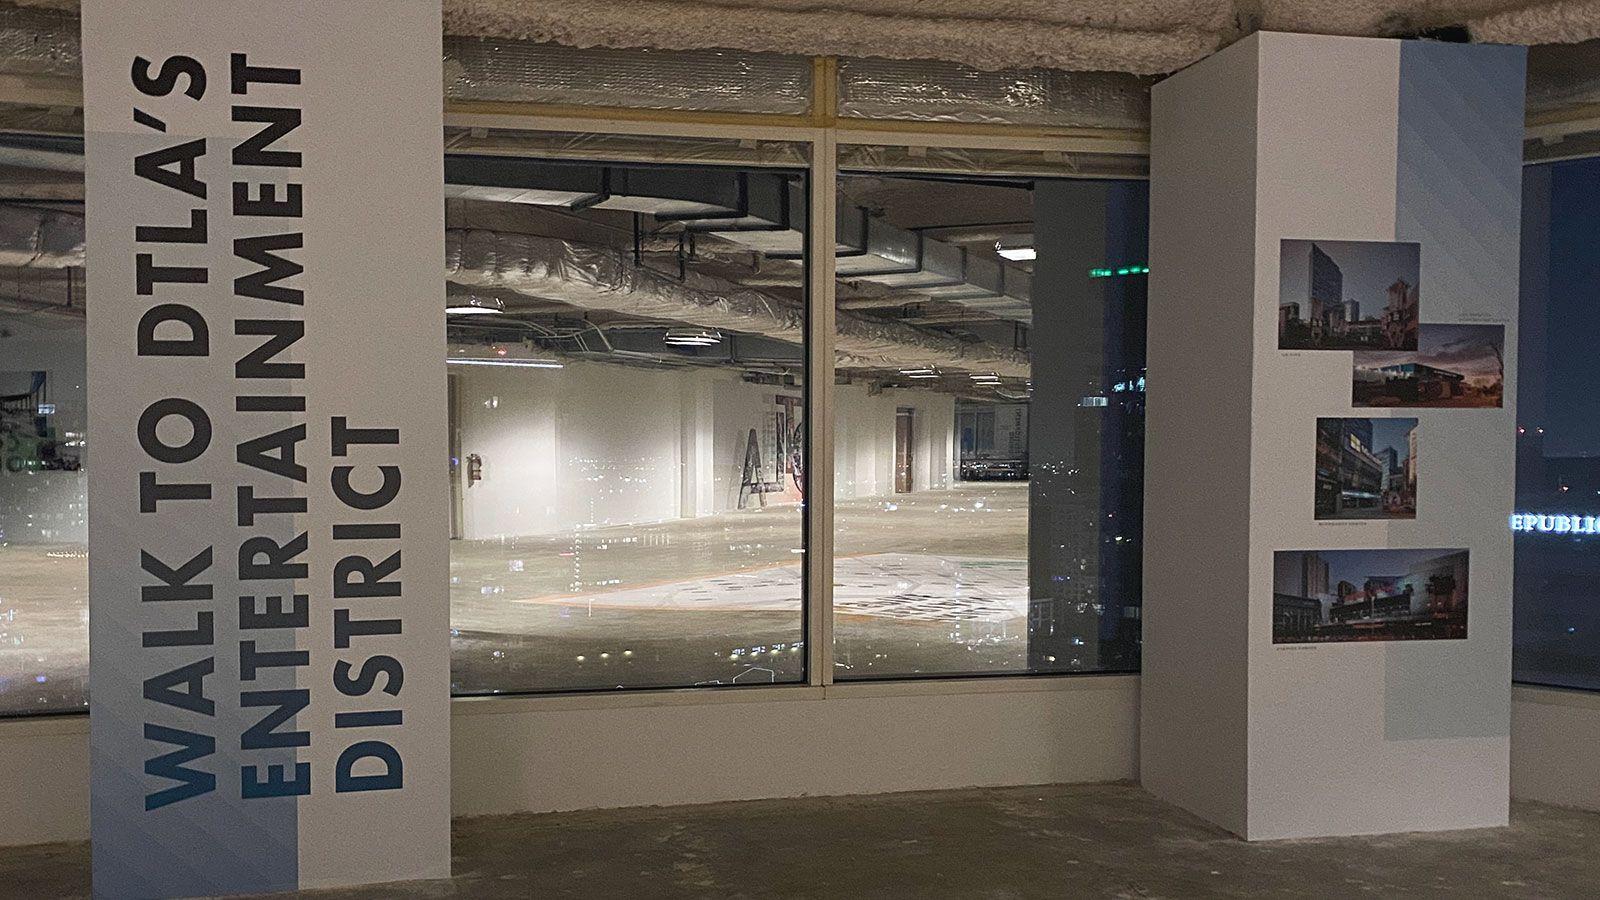 DTLA interior wall decals